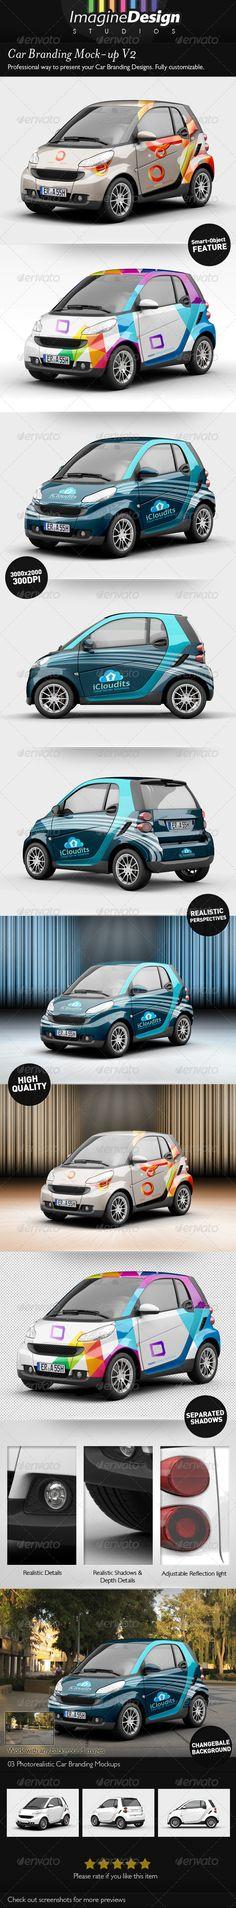 Car Branding Mock-up V2 Download here: https://graphicriver.net/item/car-branding-mockup-v2/5218891?ref=KlitVogli